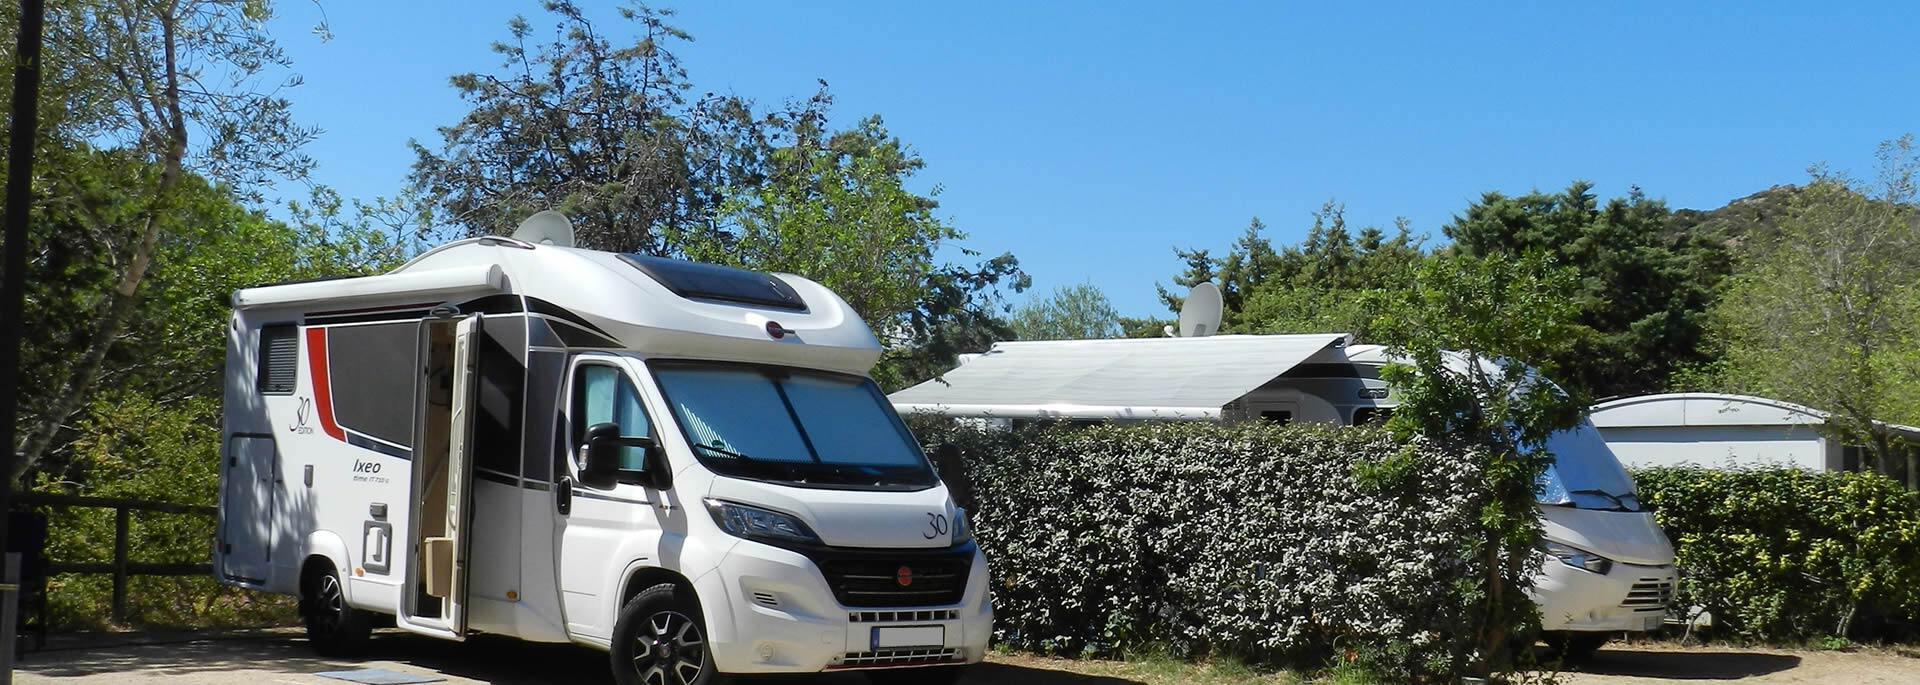 camping-tavolara fr emplacements 001